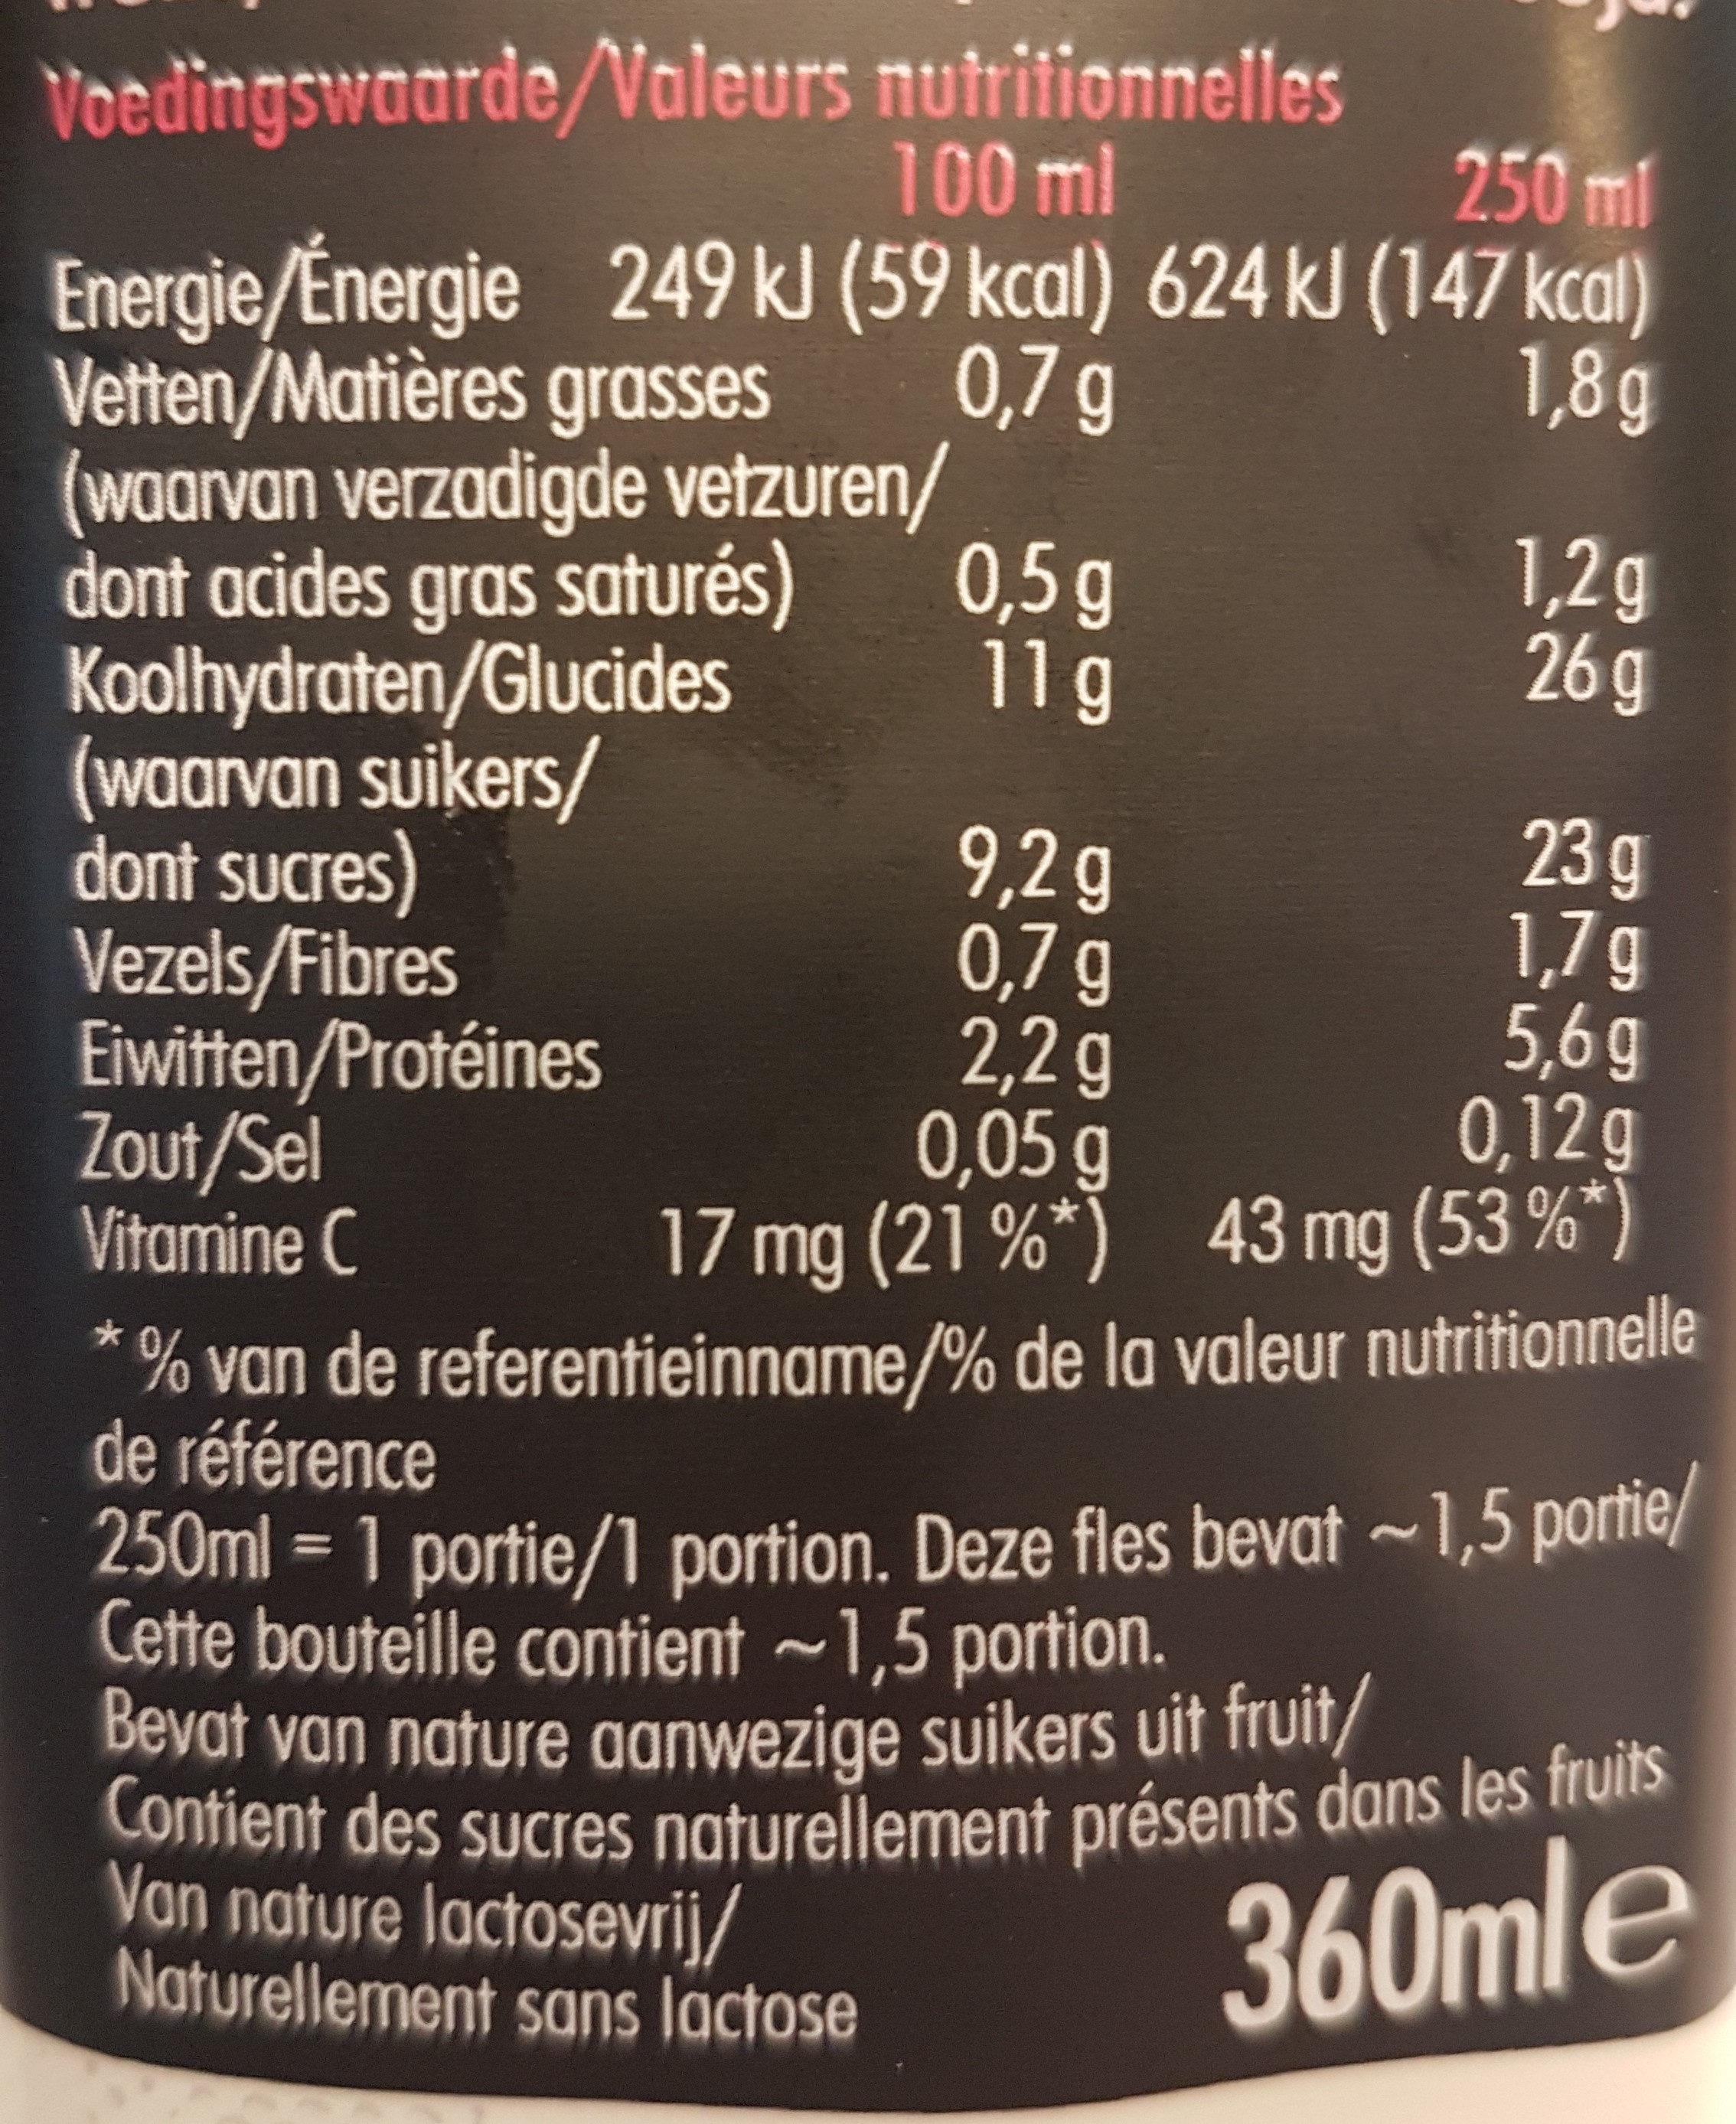 Super Smoothie Berry & Protein - Voedingswaarden